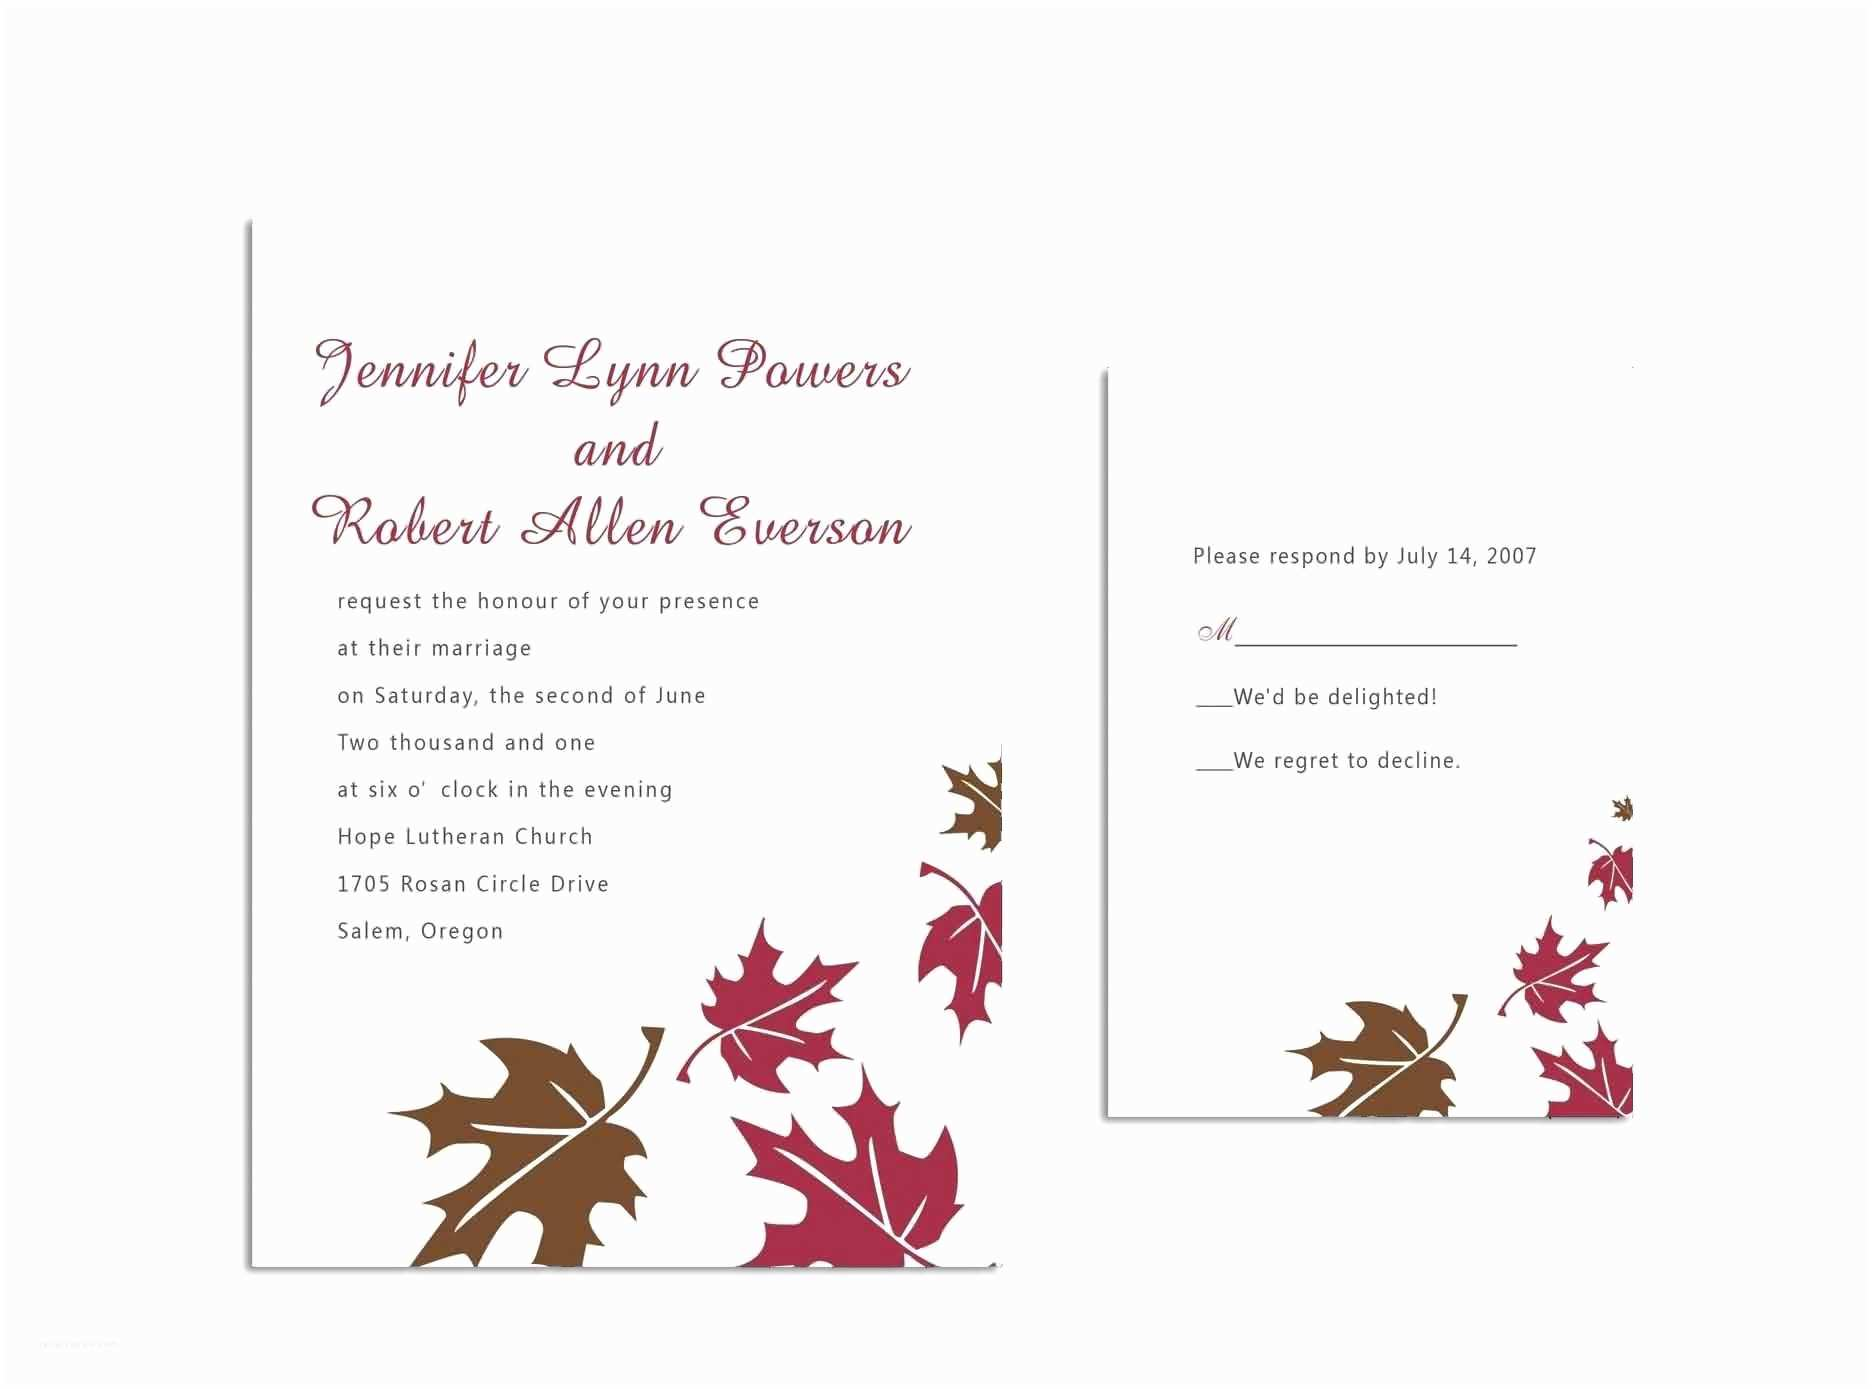 Fall Wedding Invitations Cheap Fall Wedding Invitations Cheap Invites 28 Images Cheap